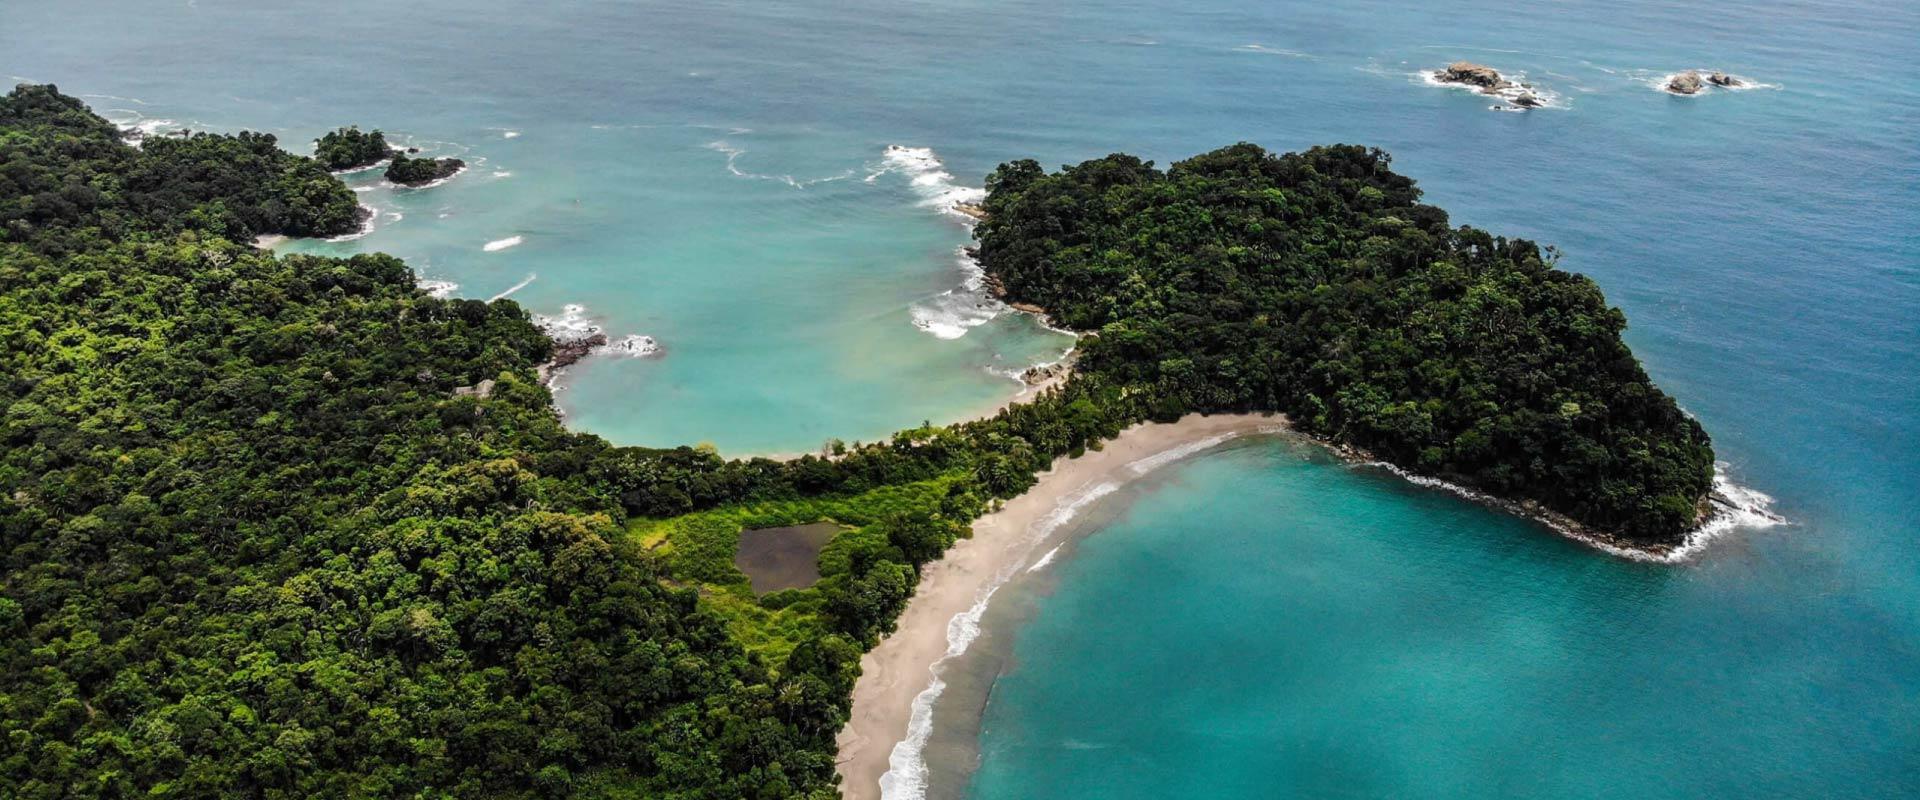 Costa Rica - Manuel Antonio Quepos